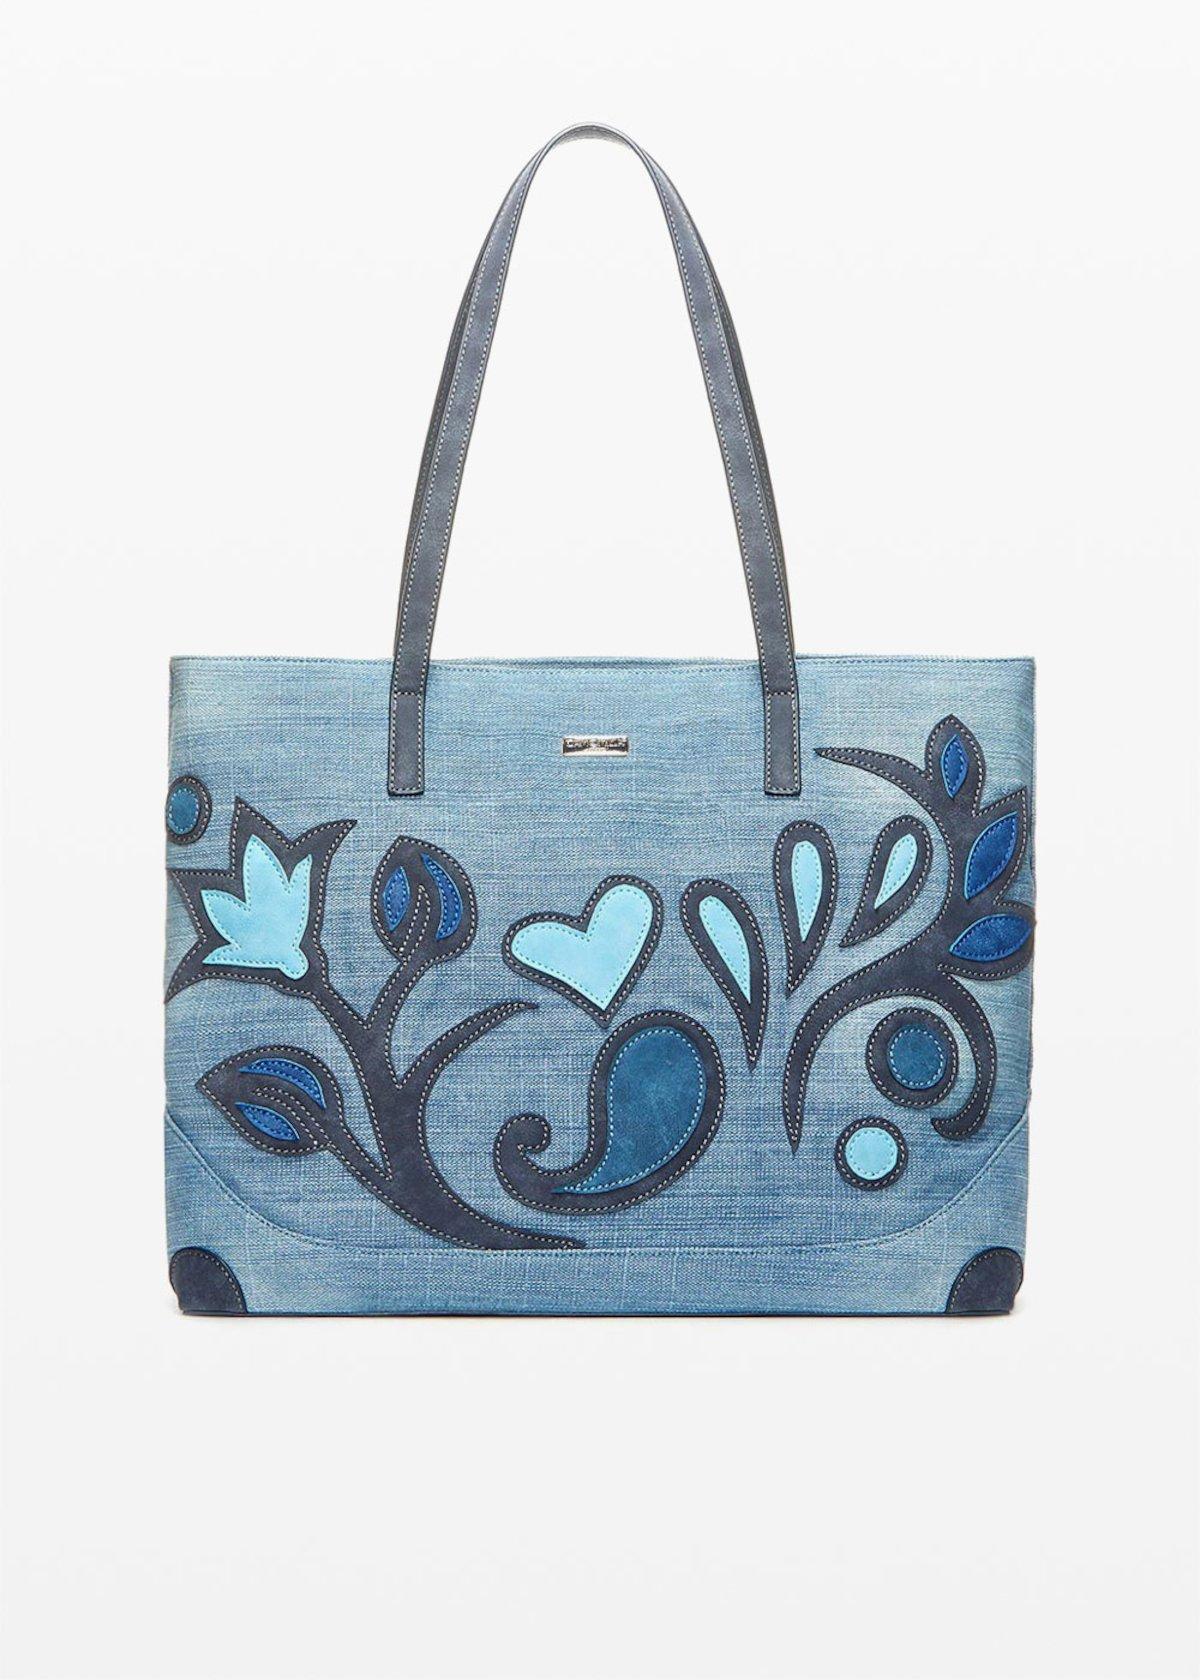 Shopping Bag Blecky effetto denim dal decoro flower - Denim - Donna - Immagine categoria